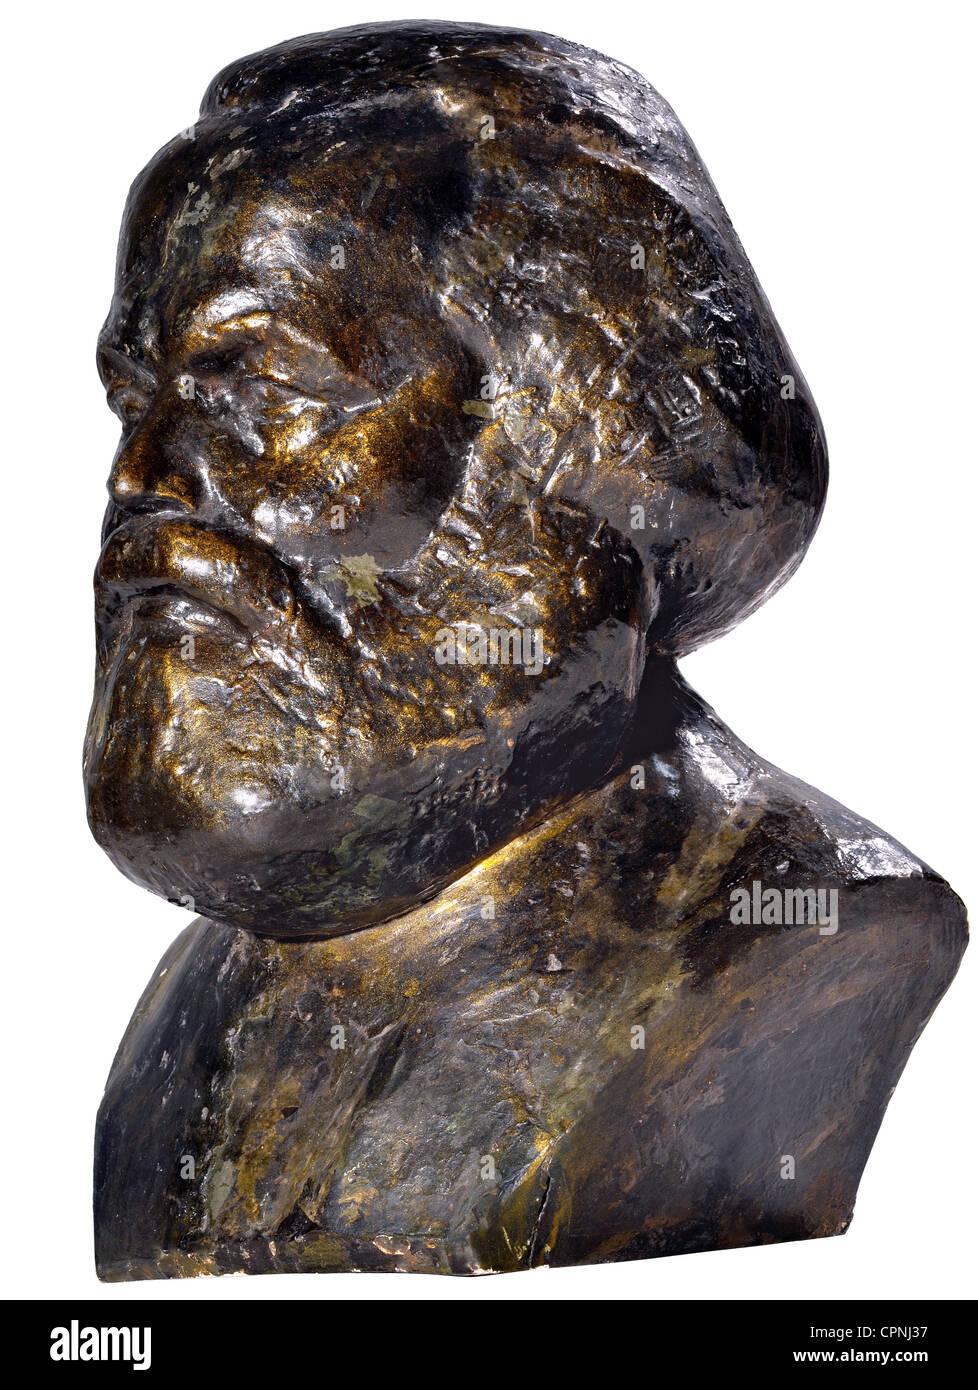 Marx, Karl, 5.5.1818 - 14.3.1883, German philosopher, portrait, plaster bust, bronze painted, on the reverse label: - Stock Image